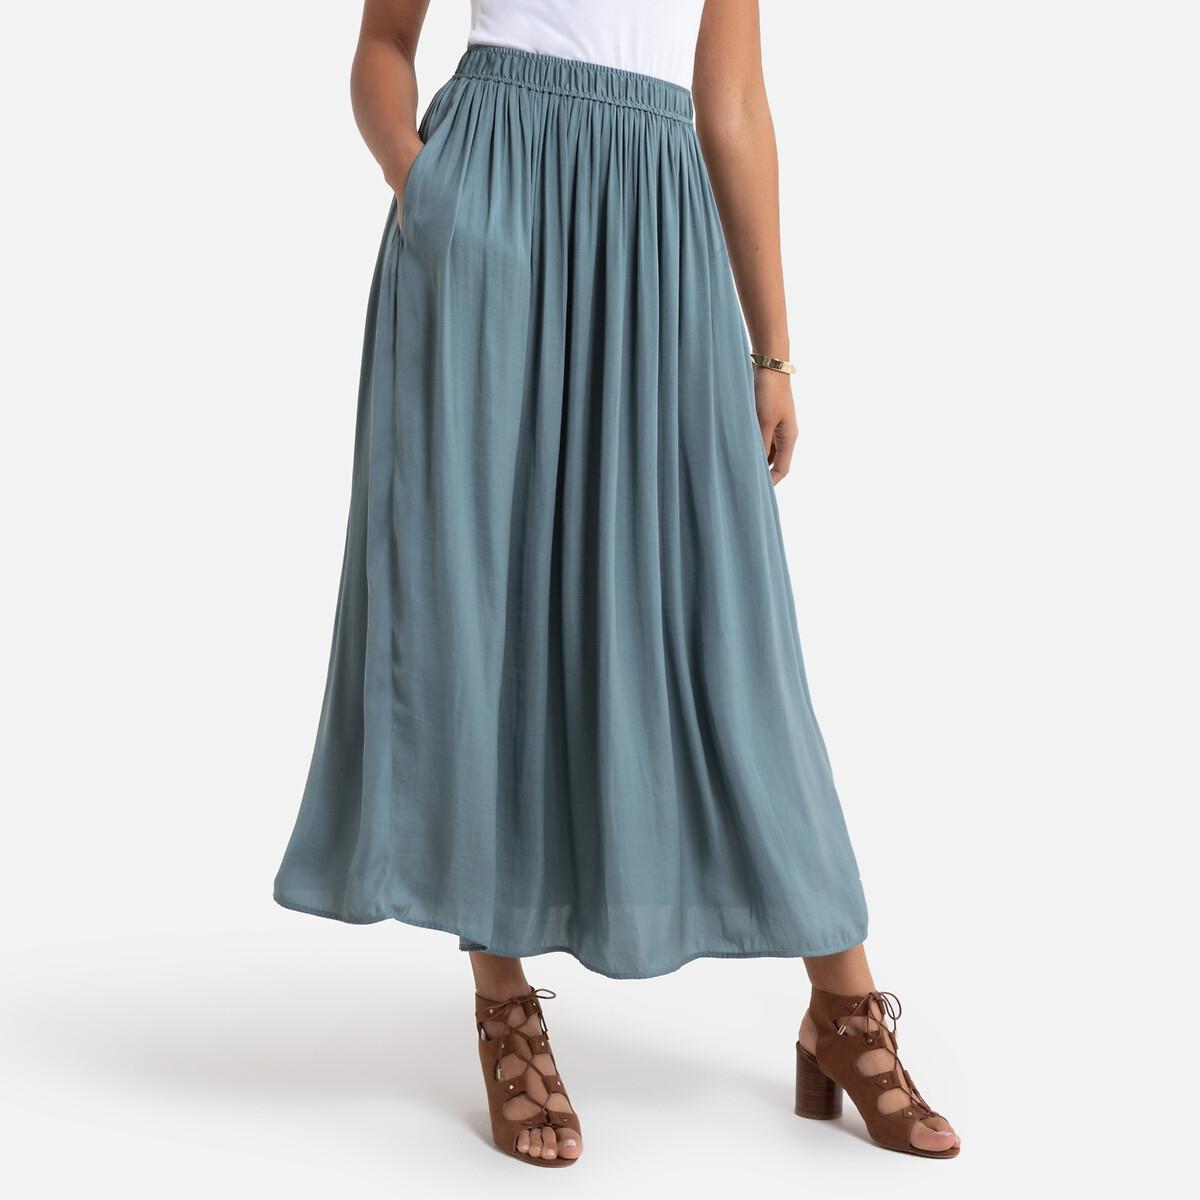 Falda plisada con largo midi